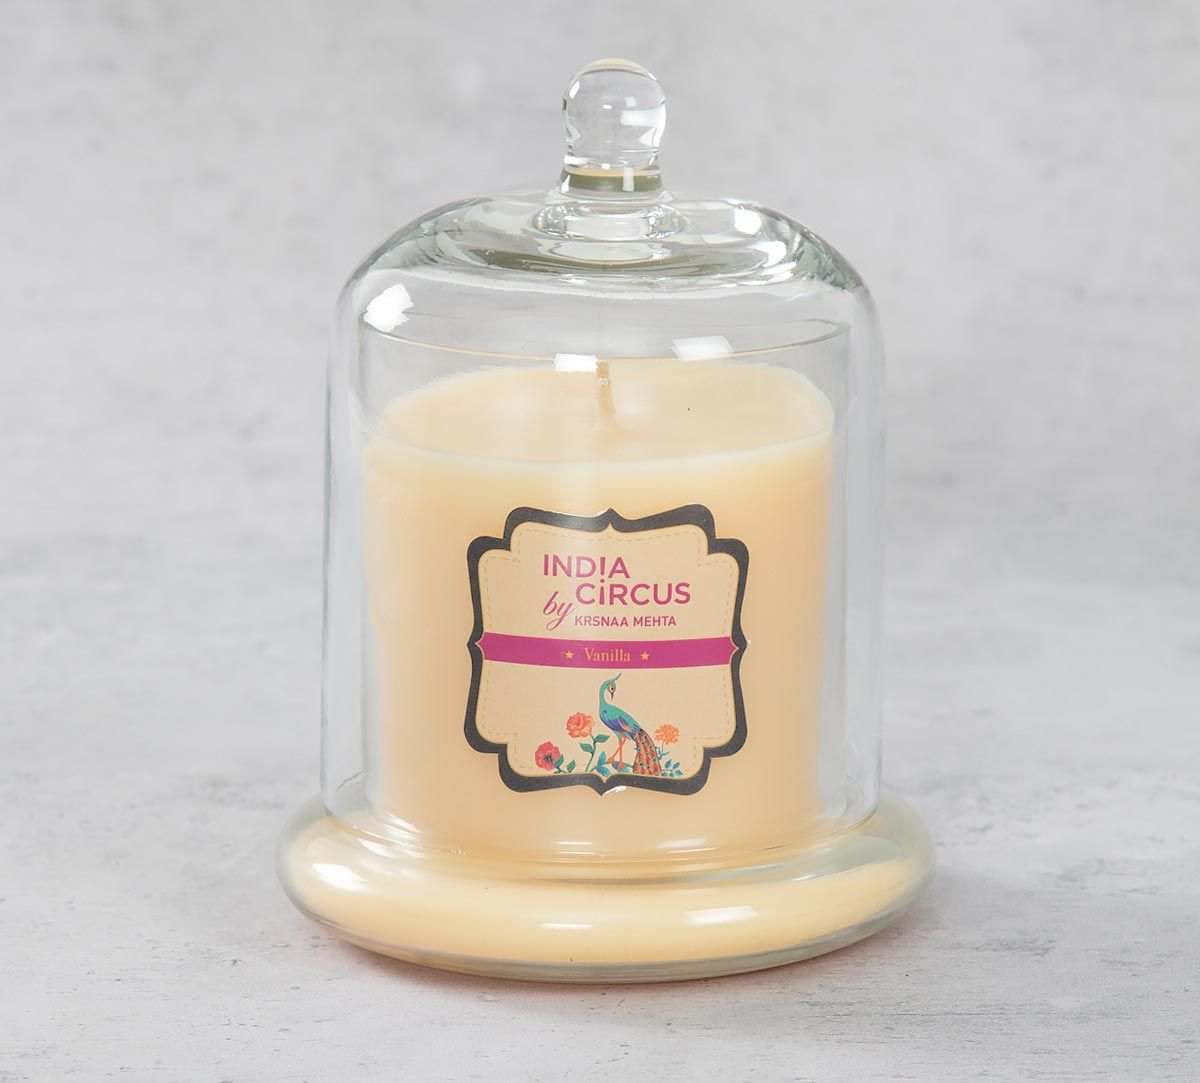 India Circus Vanilla Bean Glass Jar Scented Candle